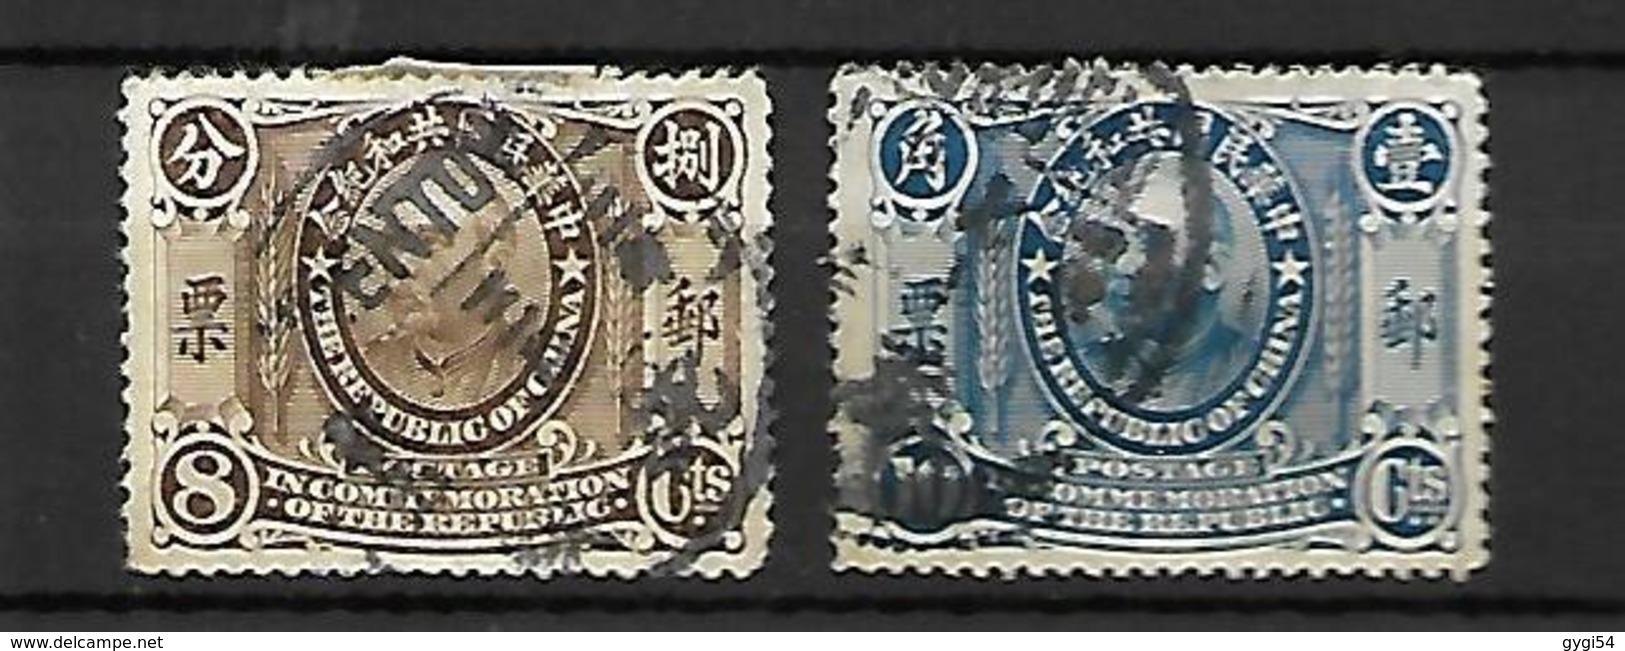 Republique Of China   Formose  Lot - 1888 Chinese Provincie